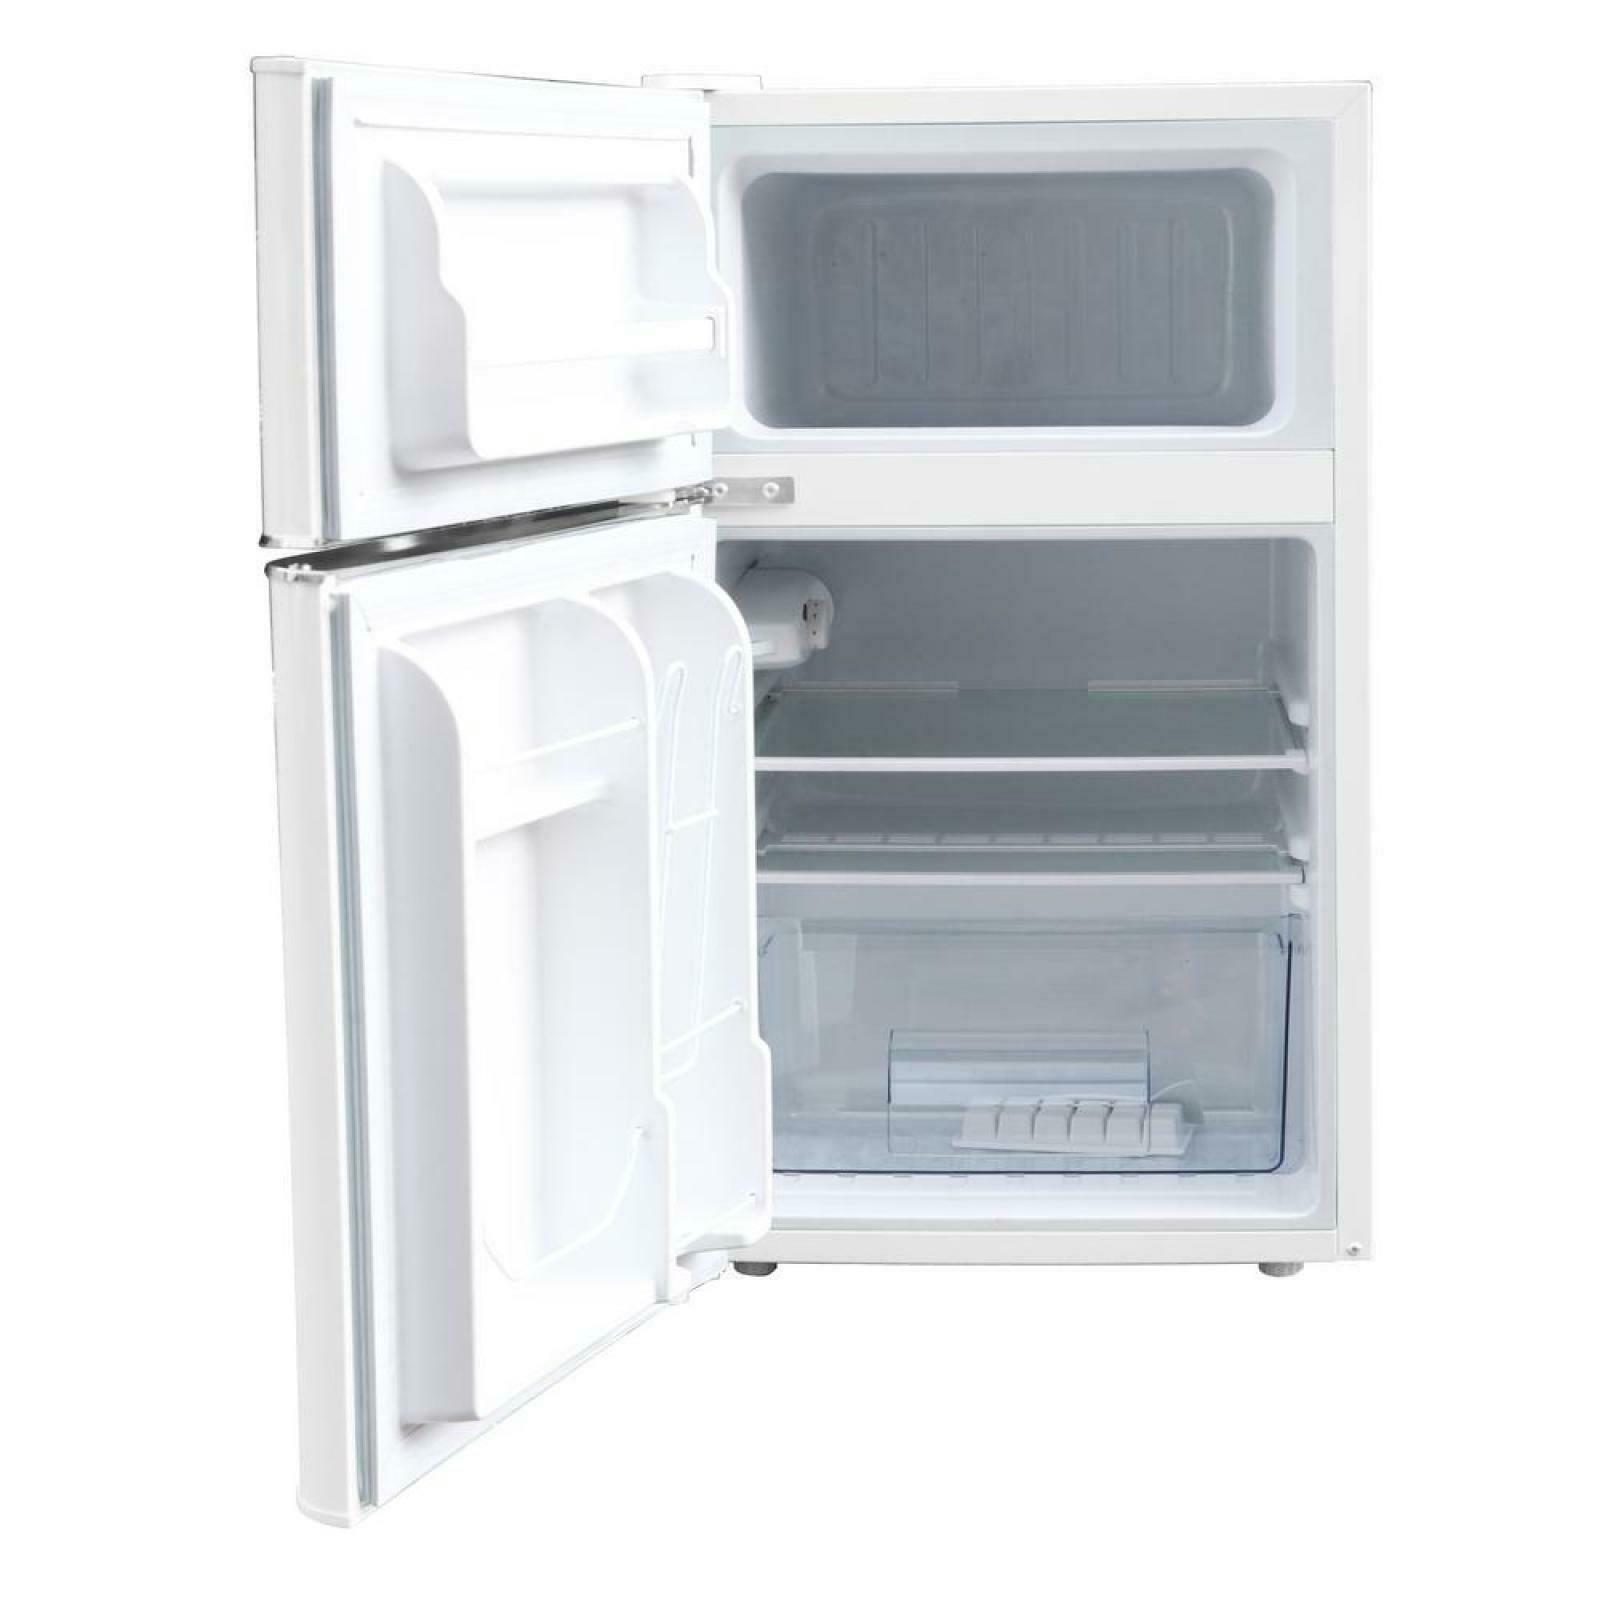 Retro Mini Fridge Freezer ft Dorm